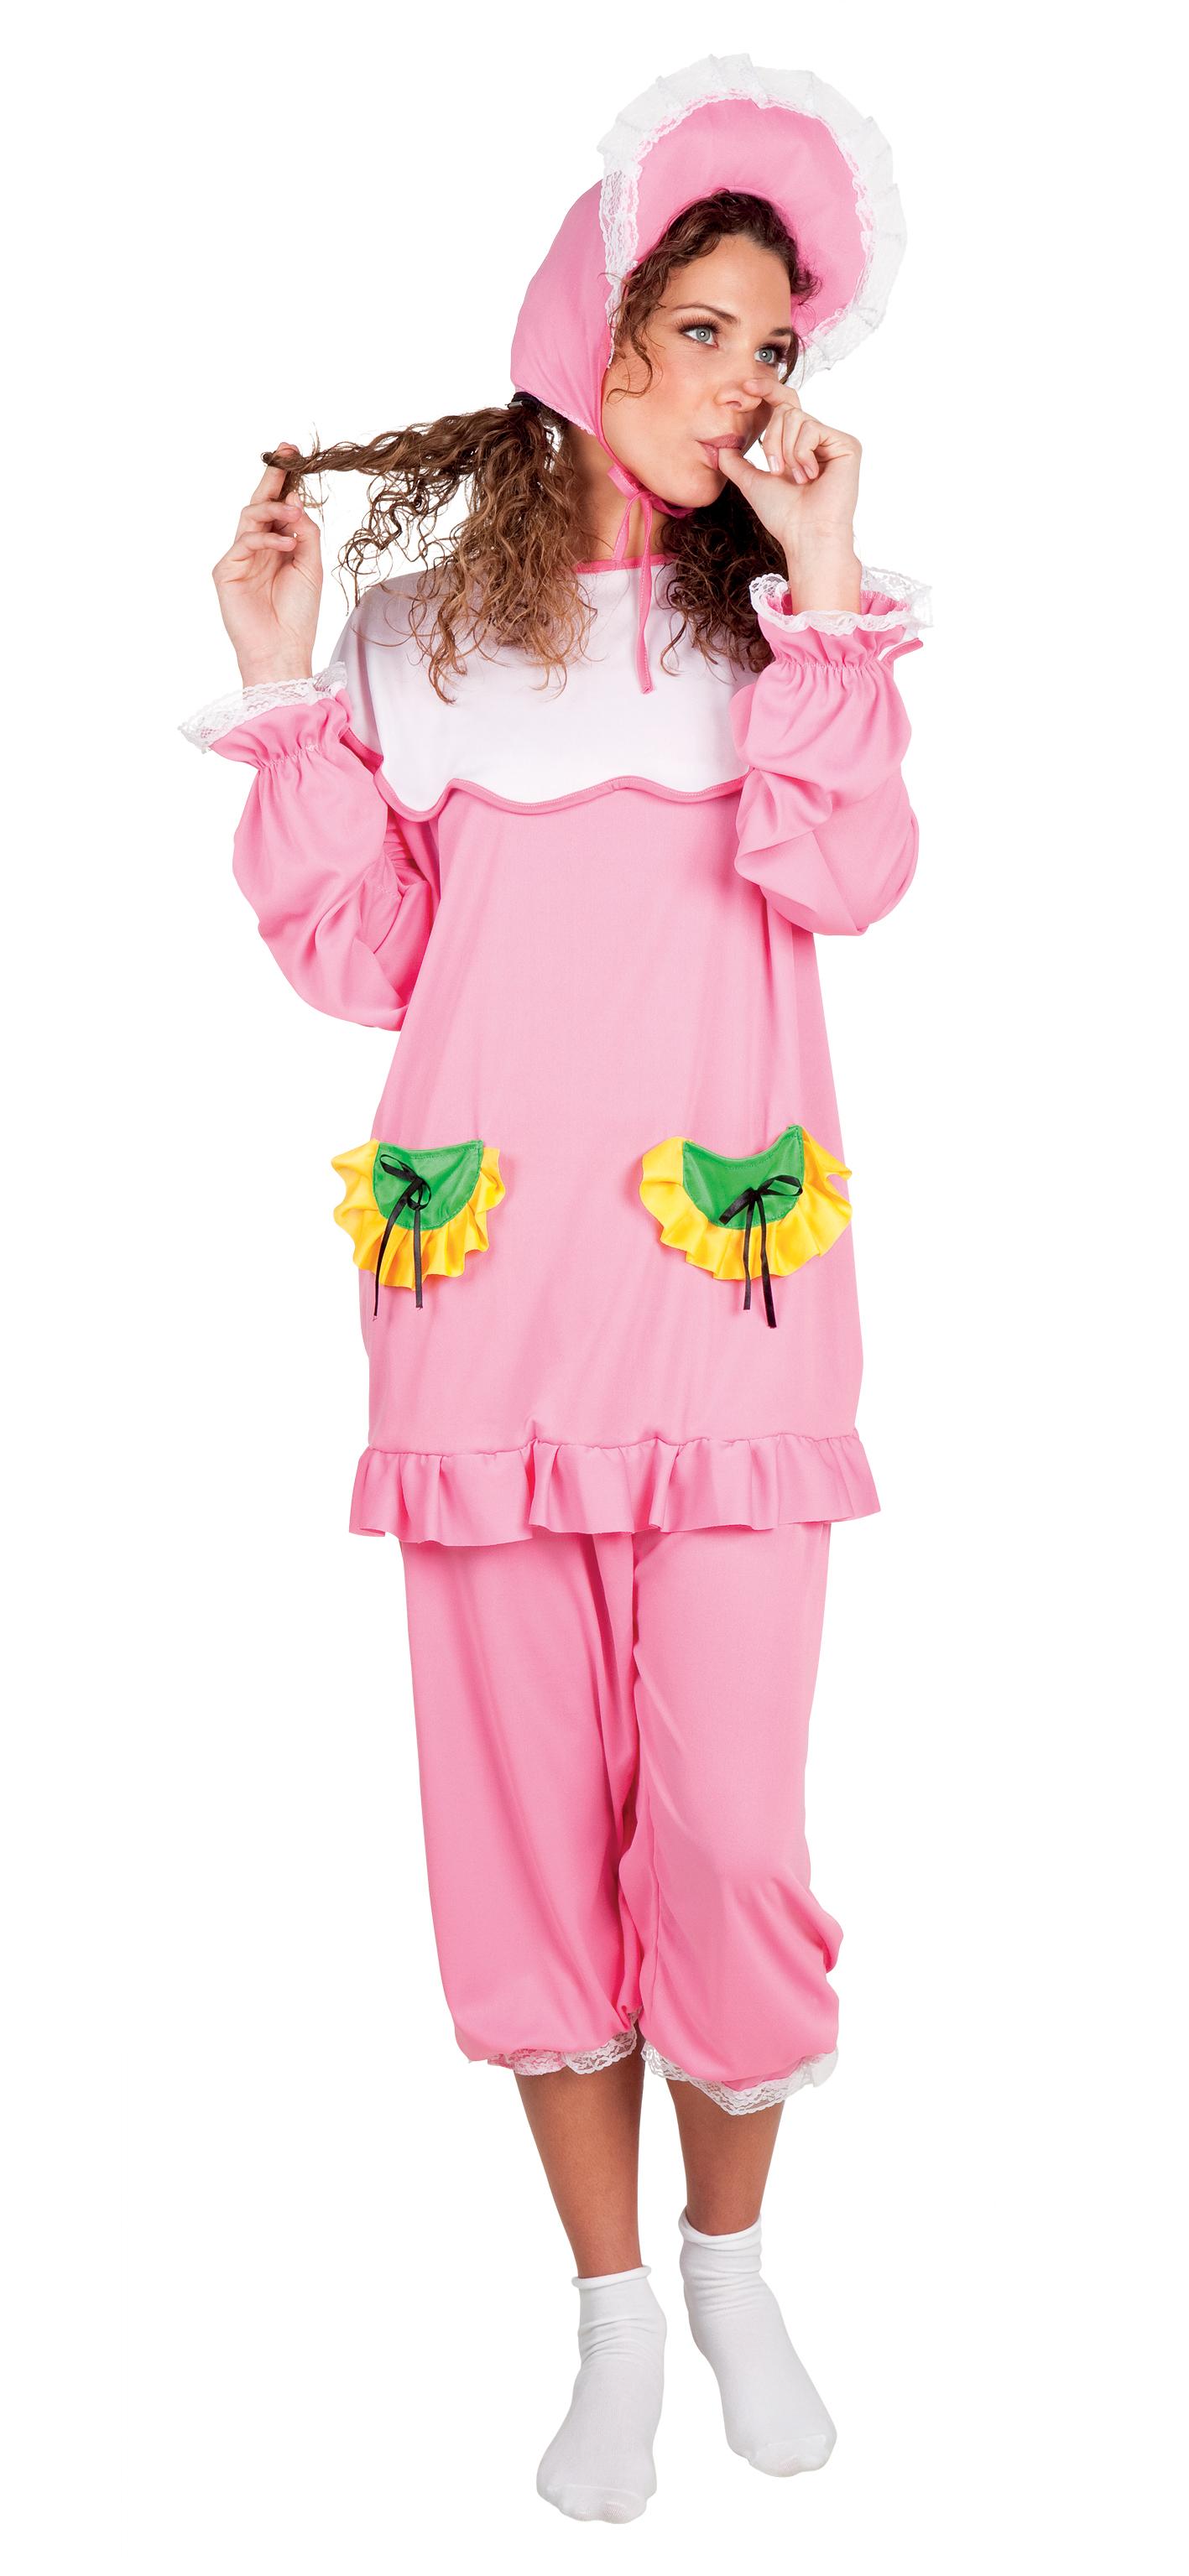 Big Baby Romper Costume | Hen Party Costumes | Mega Fancy Dress